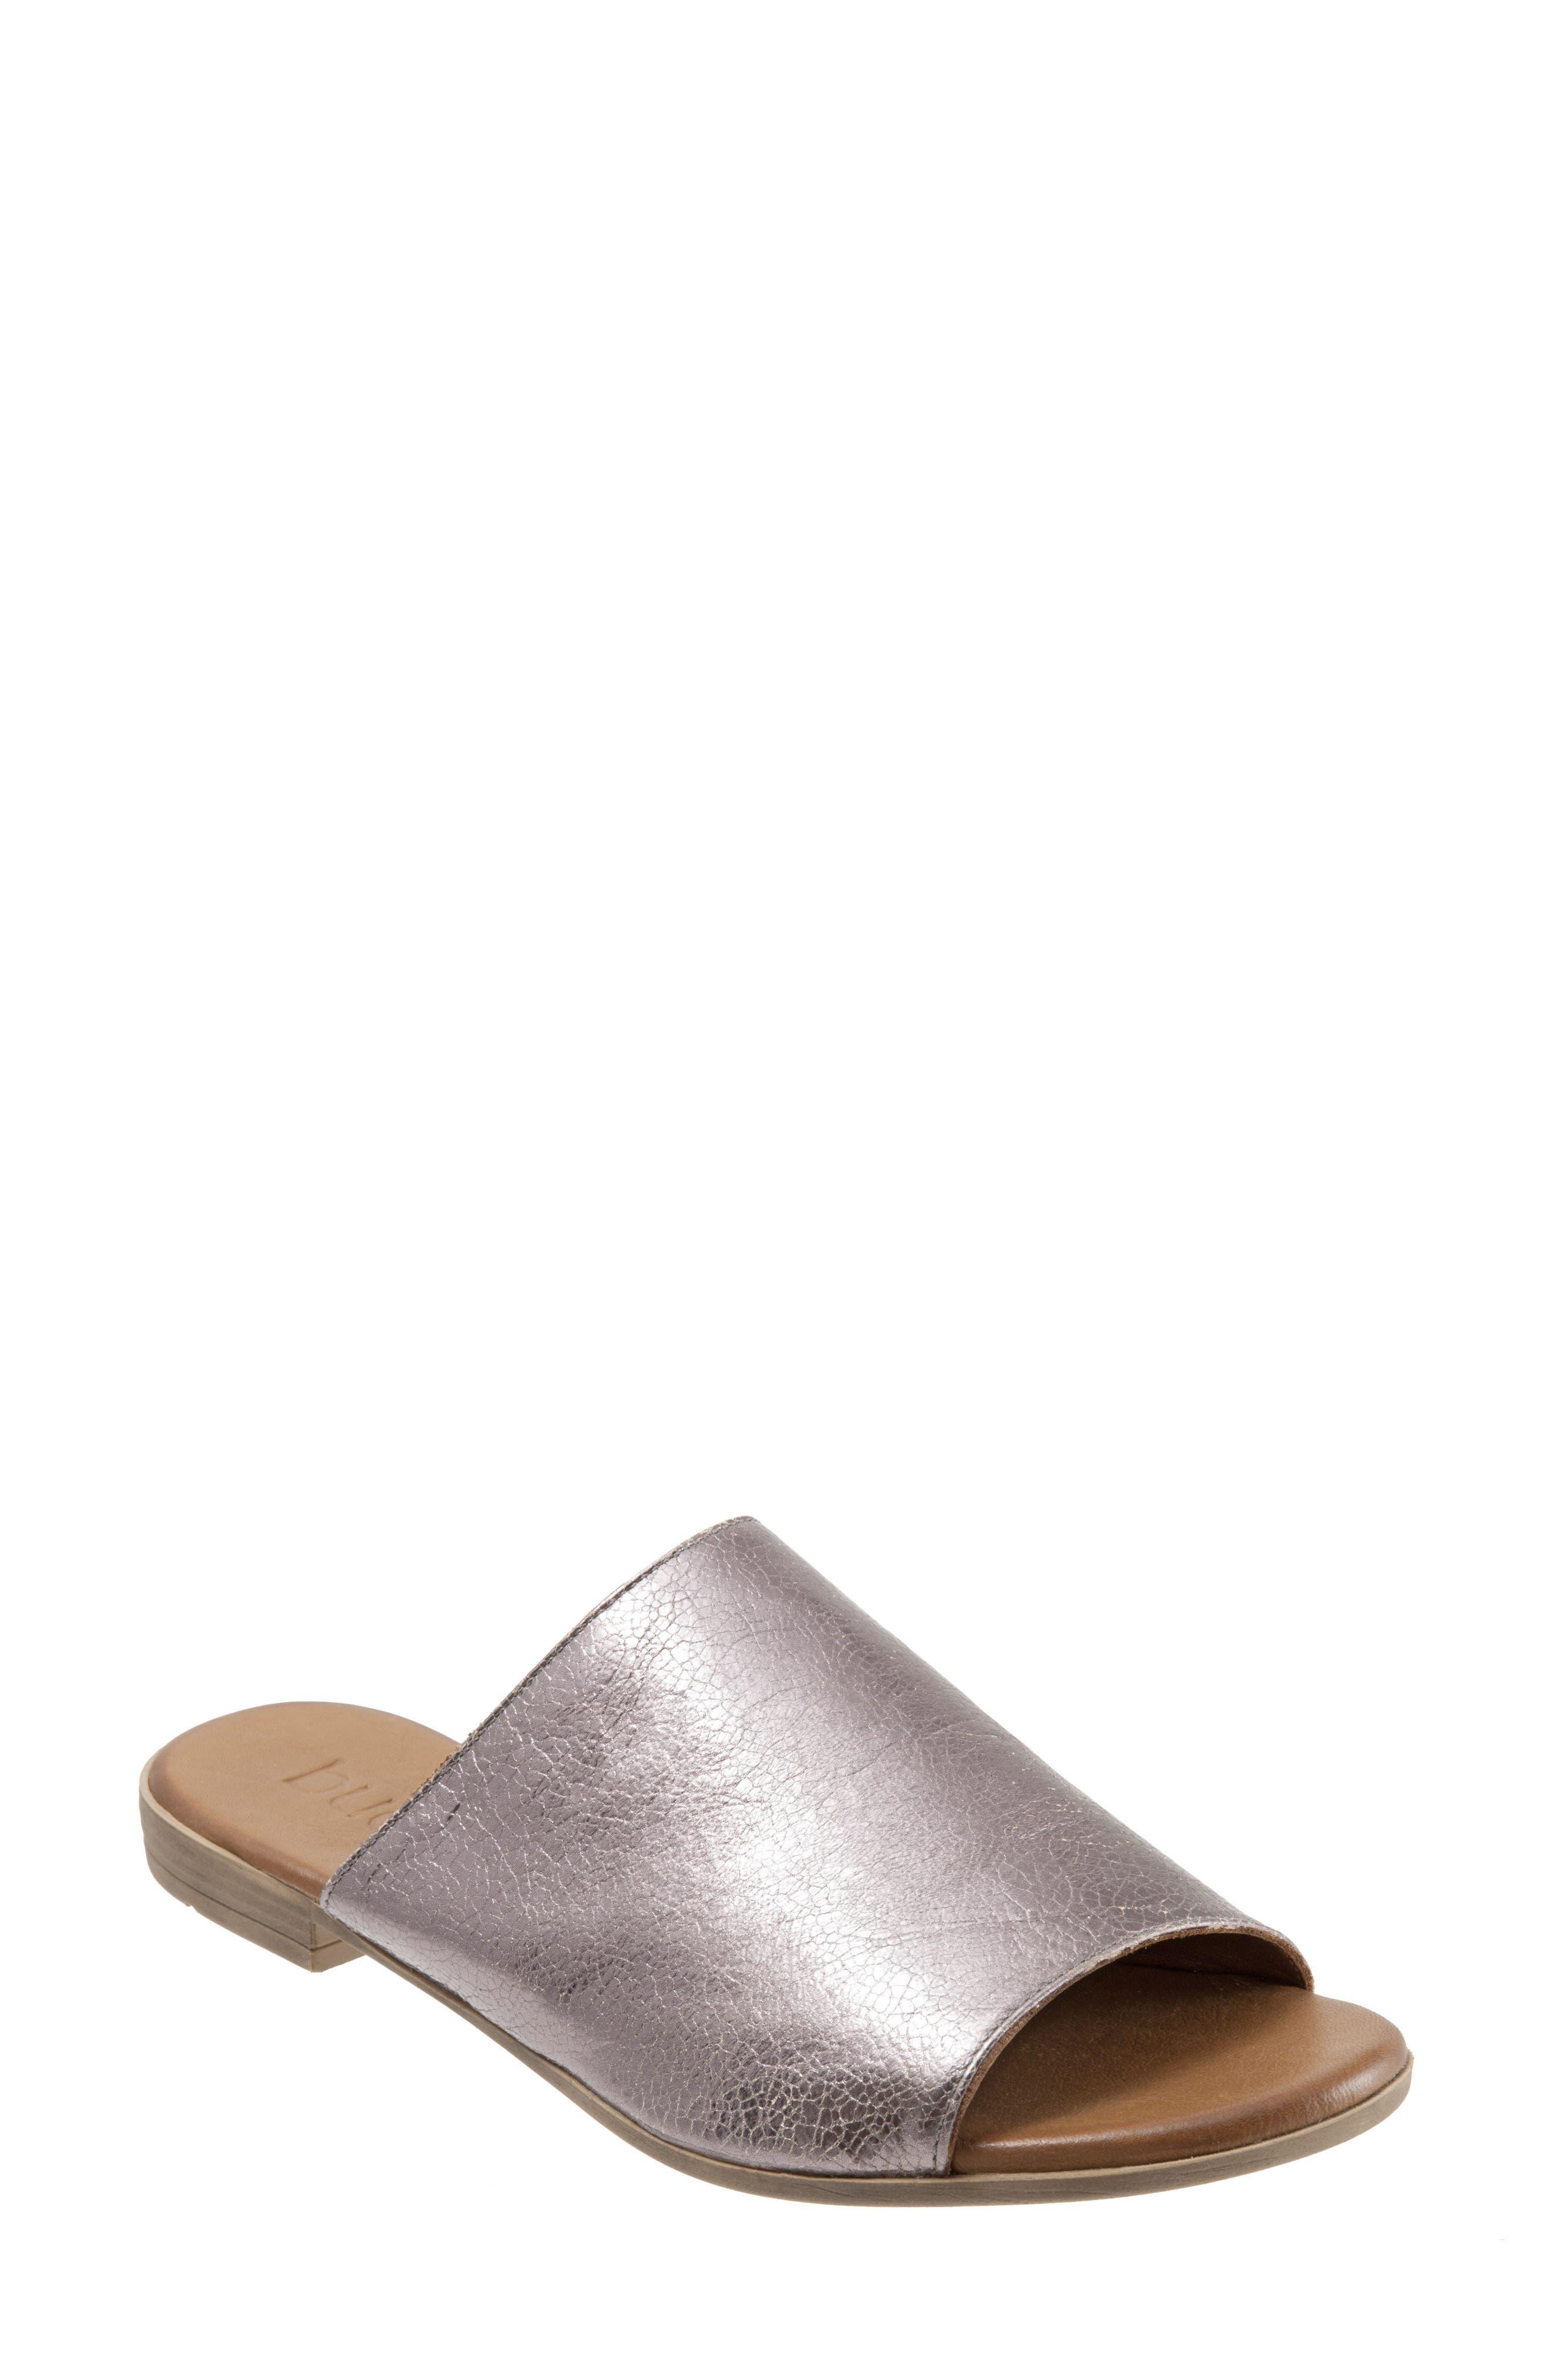 Bueno Jory Slide Sandal - Metallic